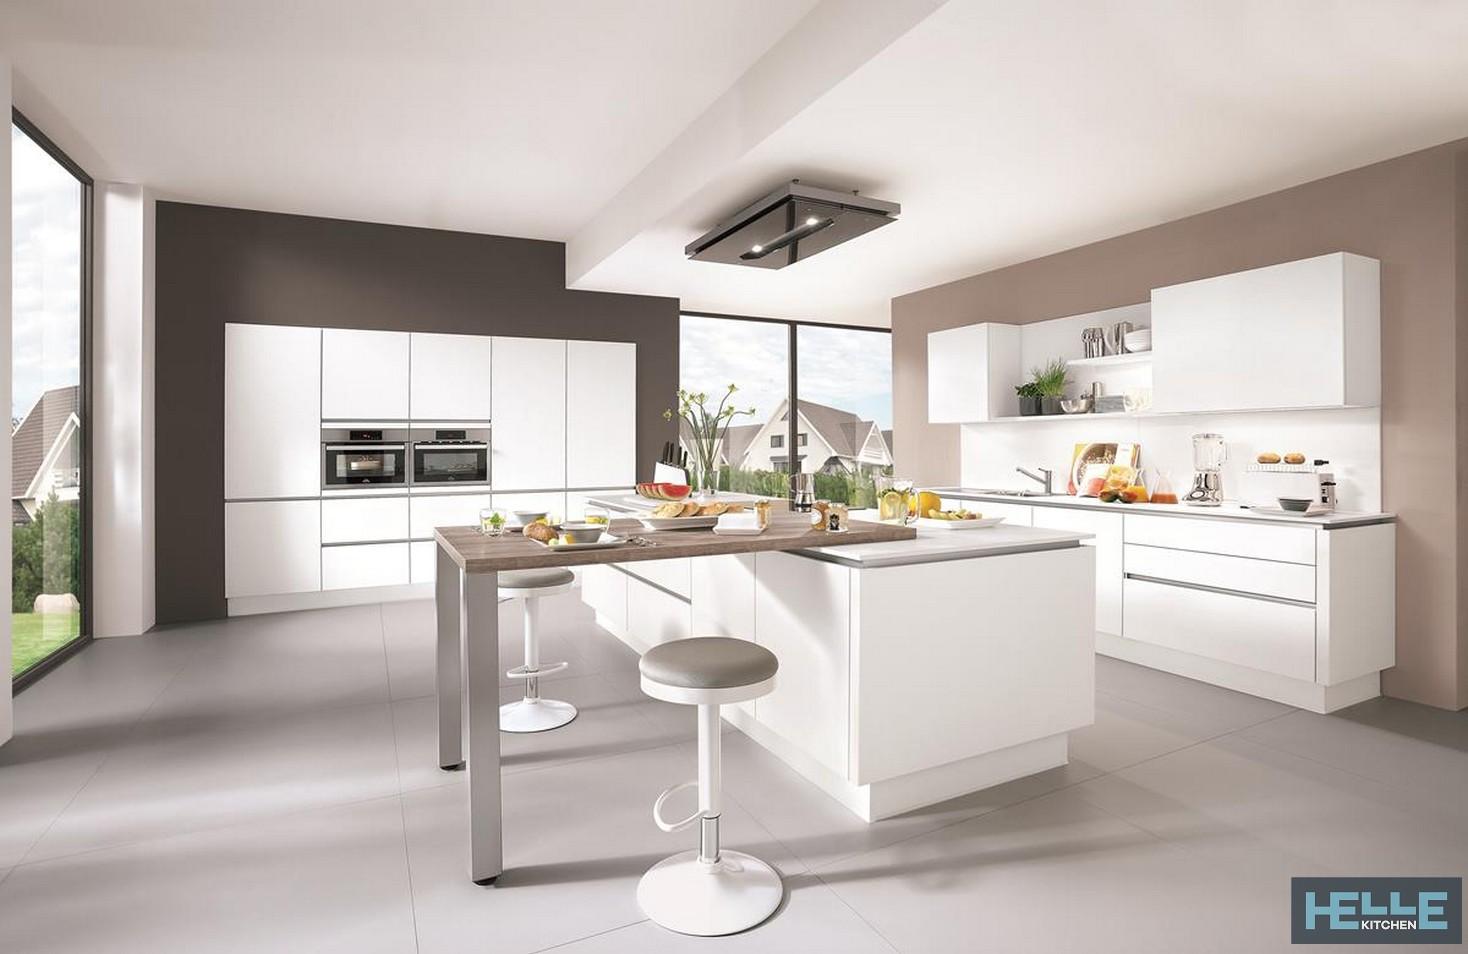 Unico Ambiente Cucina Soggiorno cucina helle linen white411 | helle kitchen